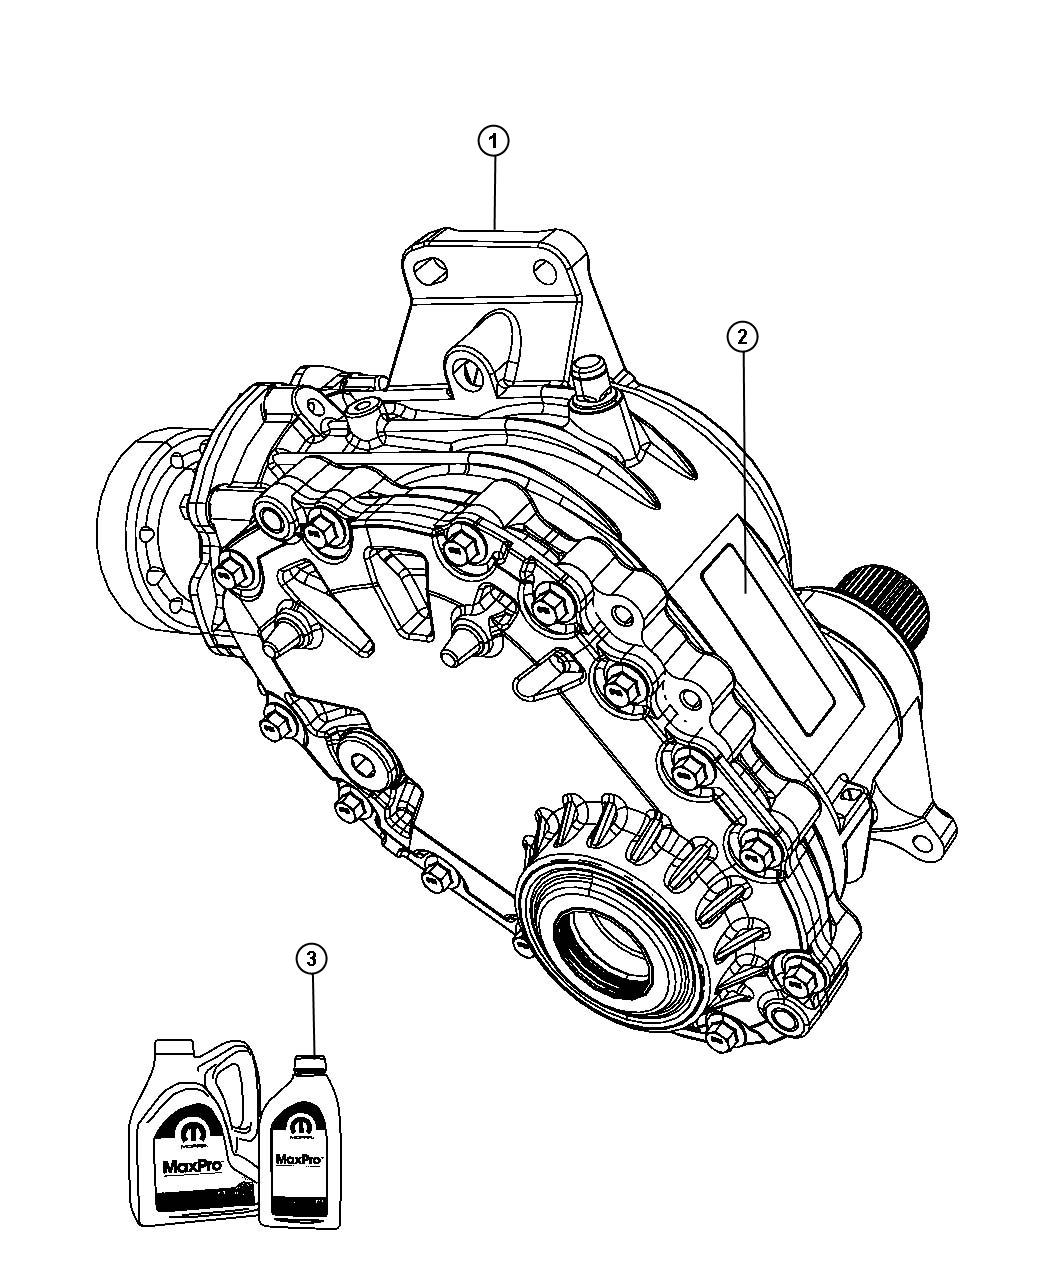 2011 Dodge Journey Power transfer unit. Mounting, awd